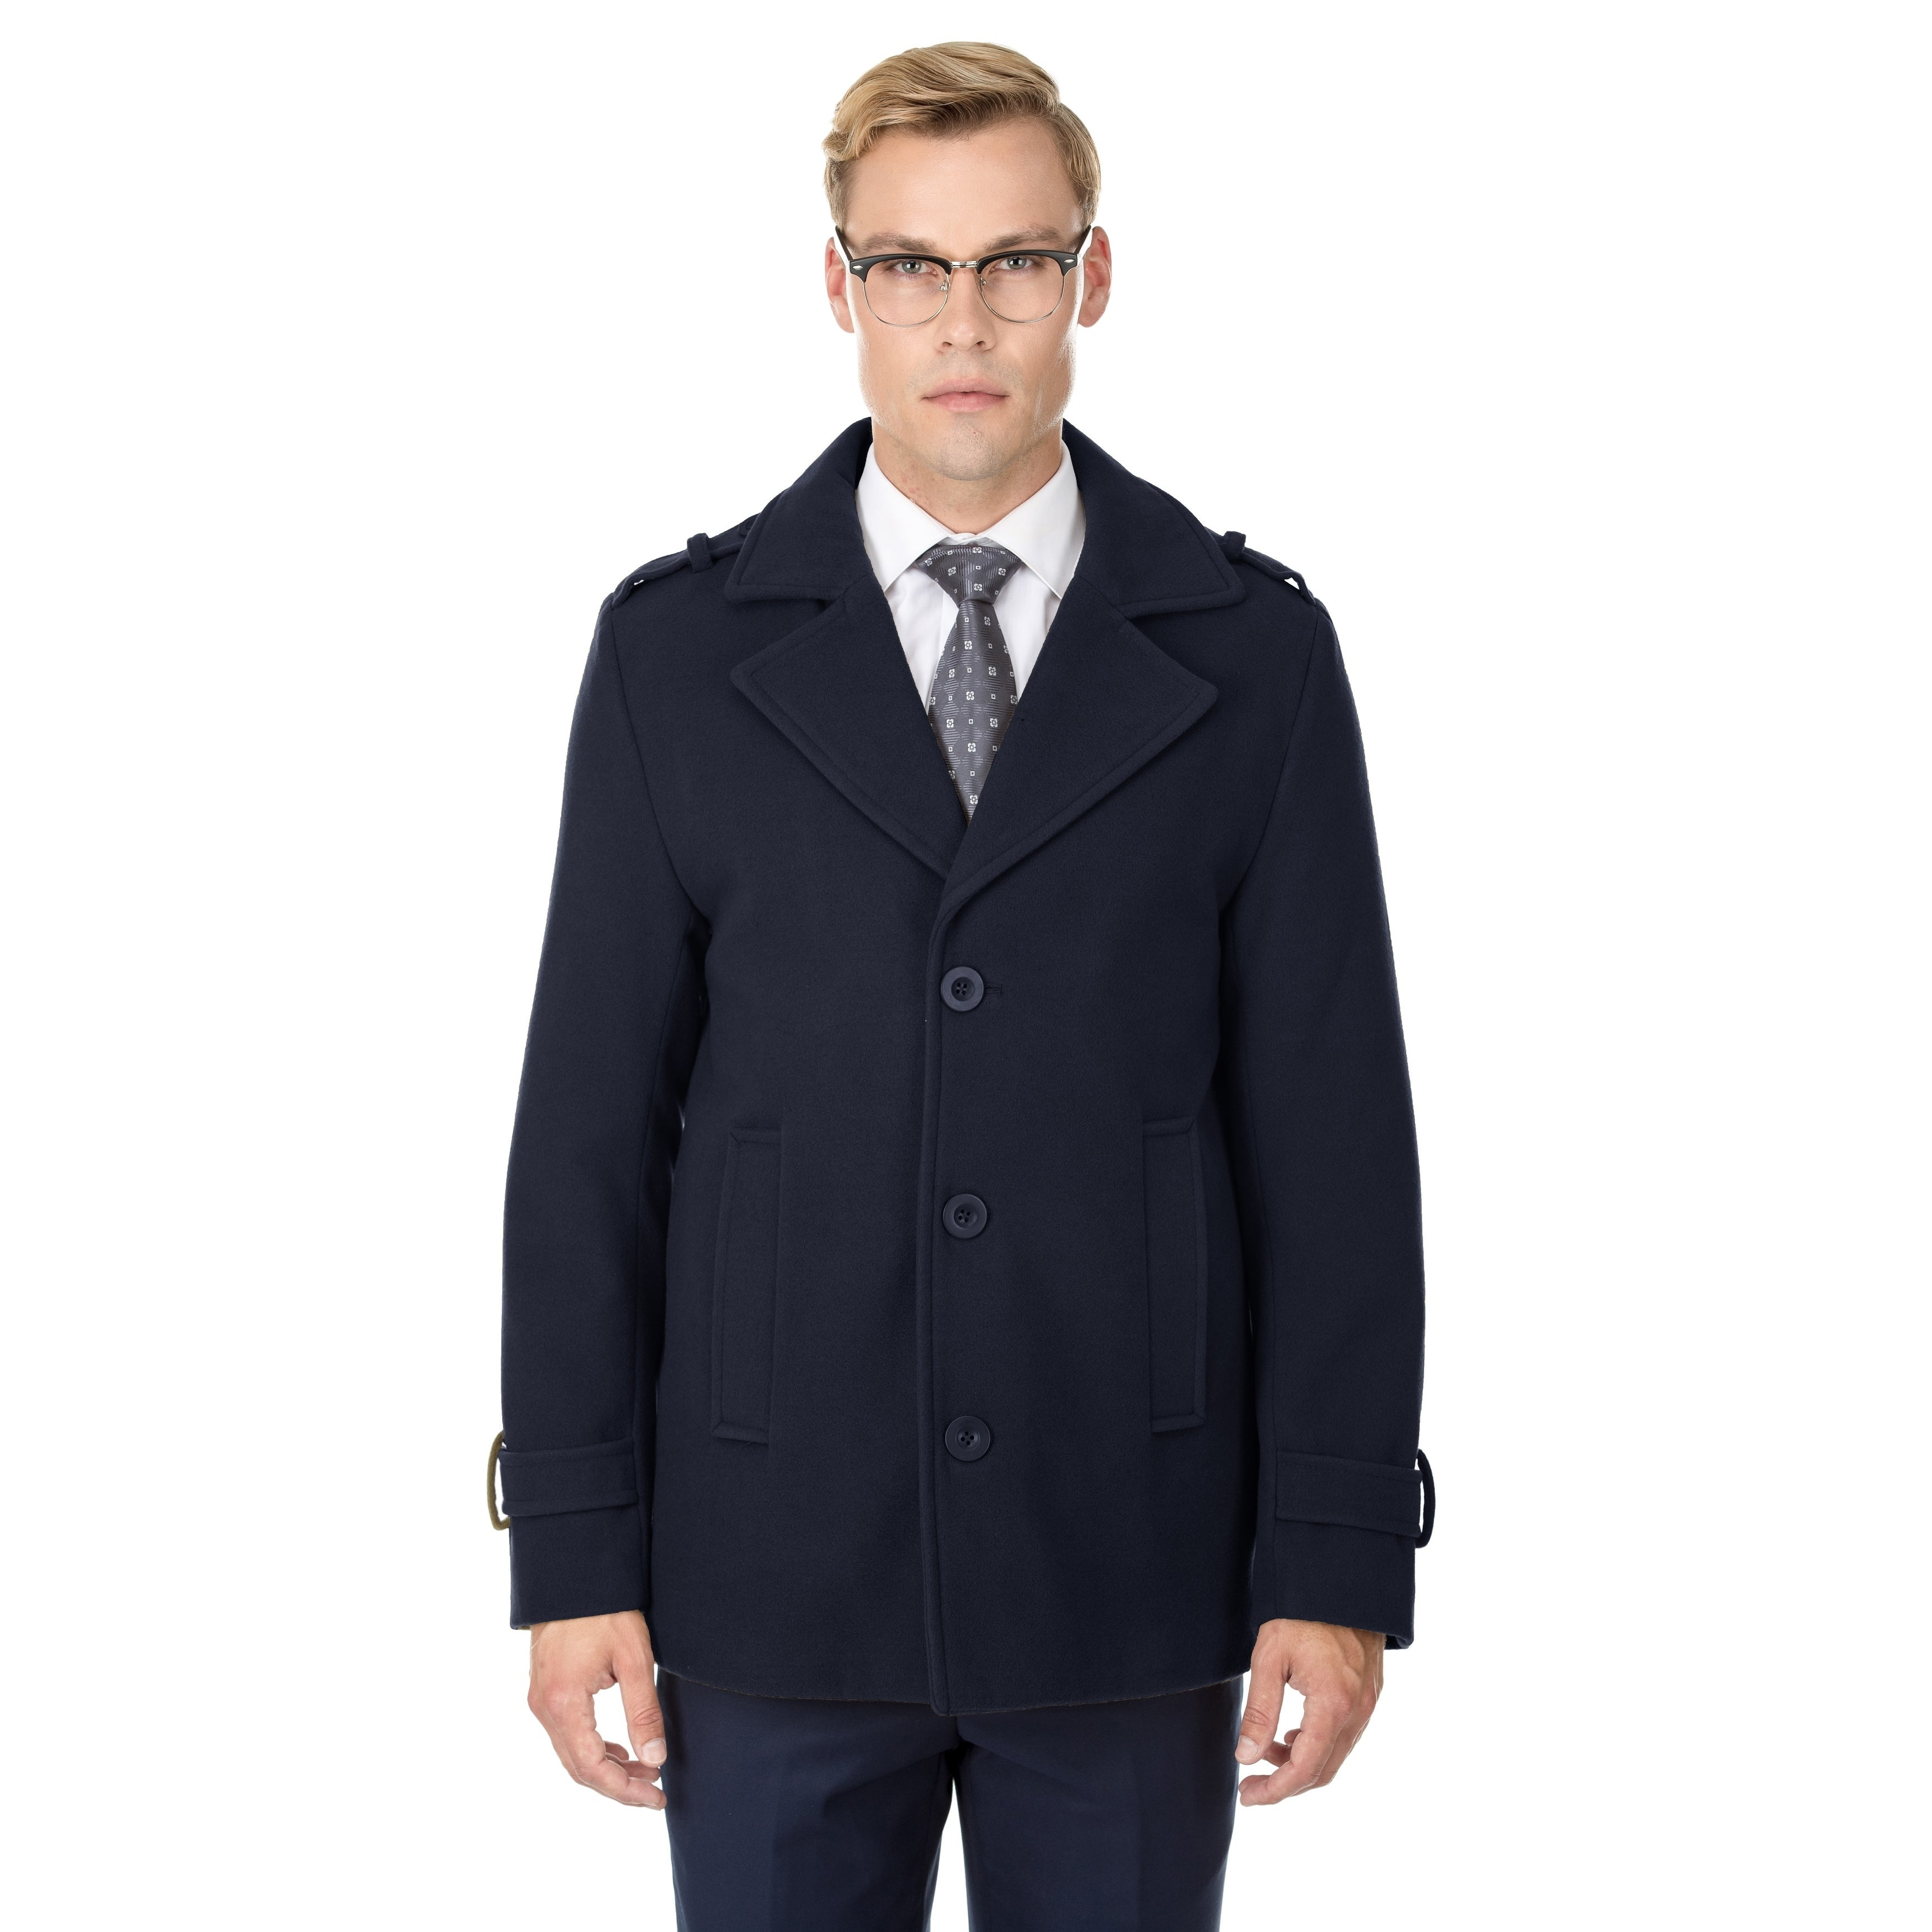 d0806e9461 Braveman Men's Single Breasted Wool Blend Coats